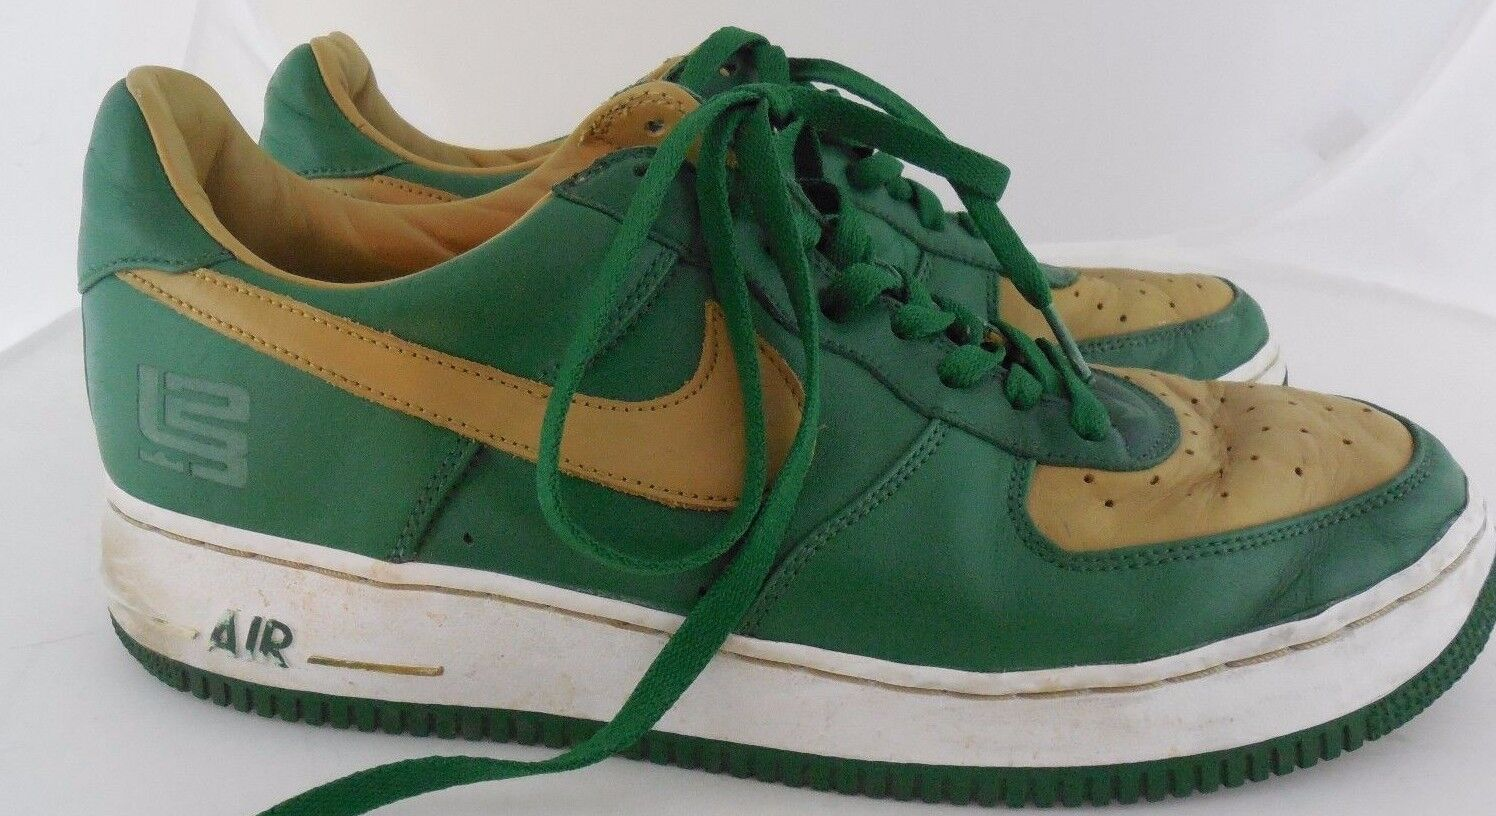 Nike Air Force 1 LTD Lebron James 309063-371 Sz 12/EURO 46 Green/Gold Irish